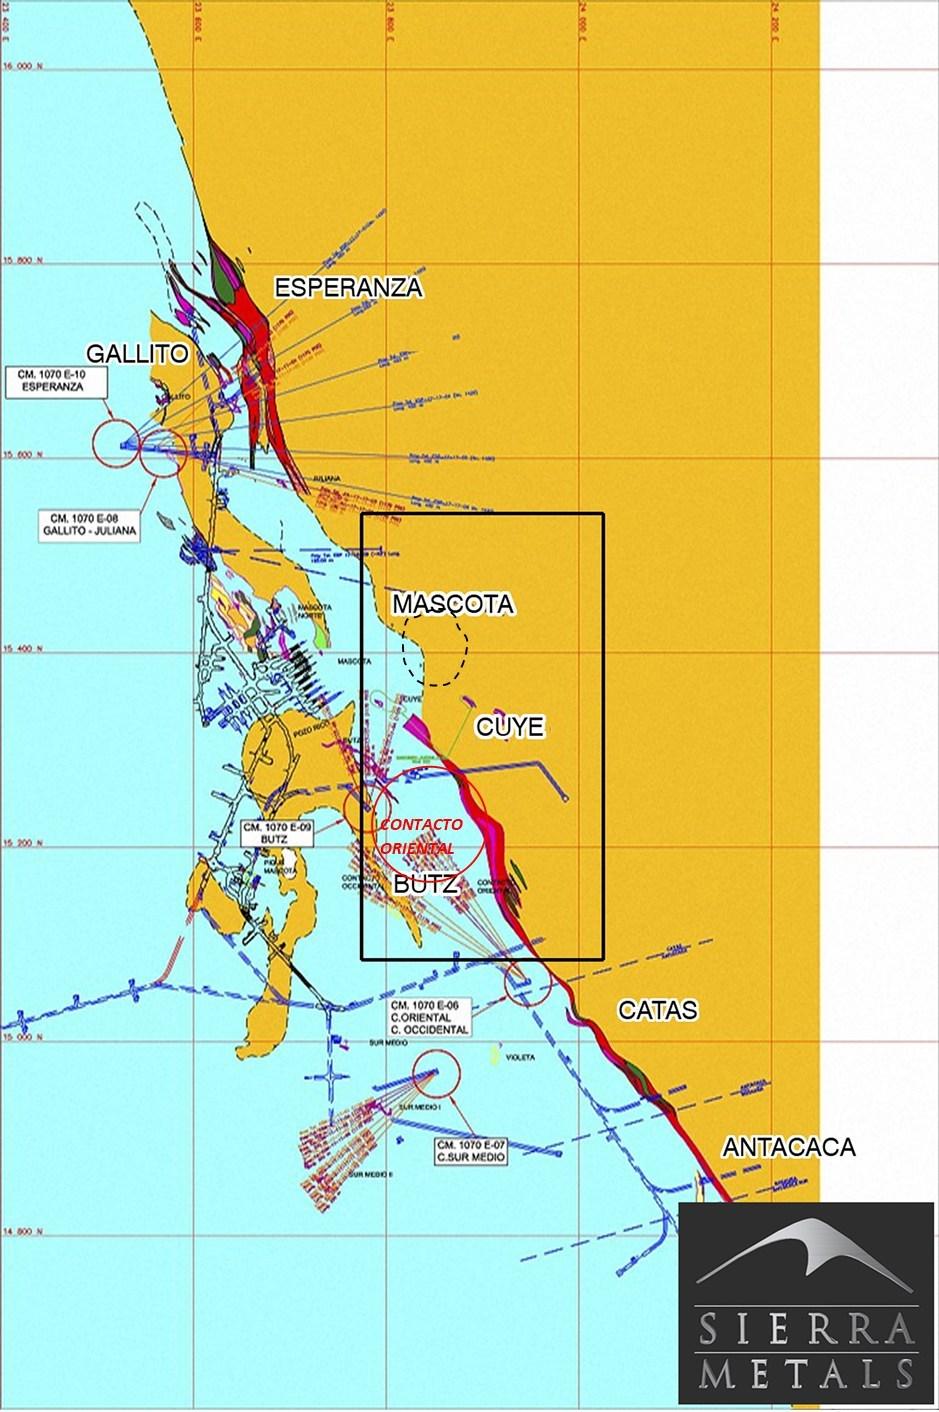 Figure 1 - Yauricocha Mine – Plan View of Yauricocha Mine and Location of Contacto Oriental Zone (CNW Group/Sierra Metals Inc.)